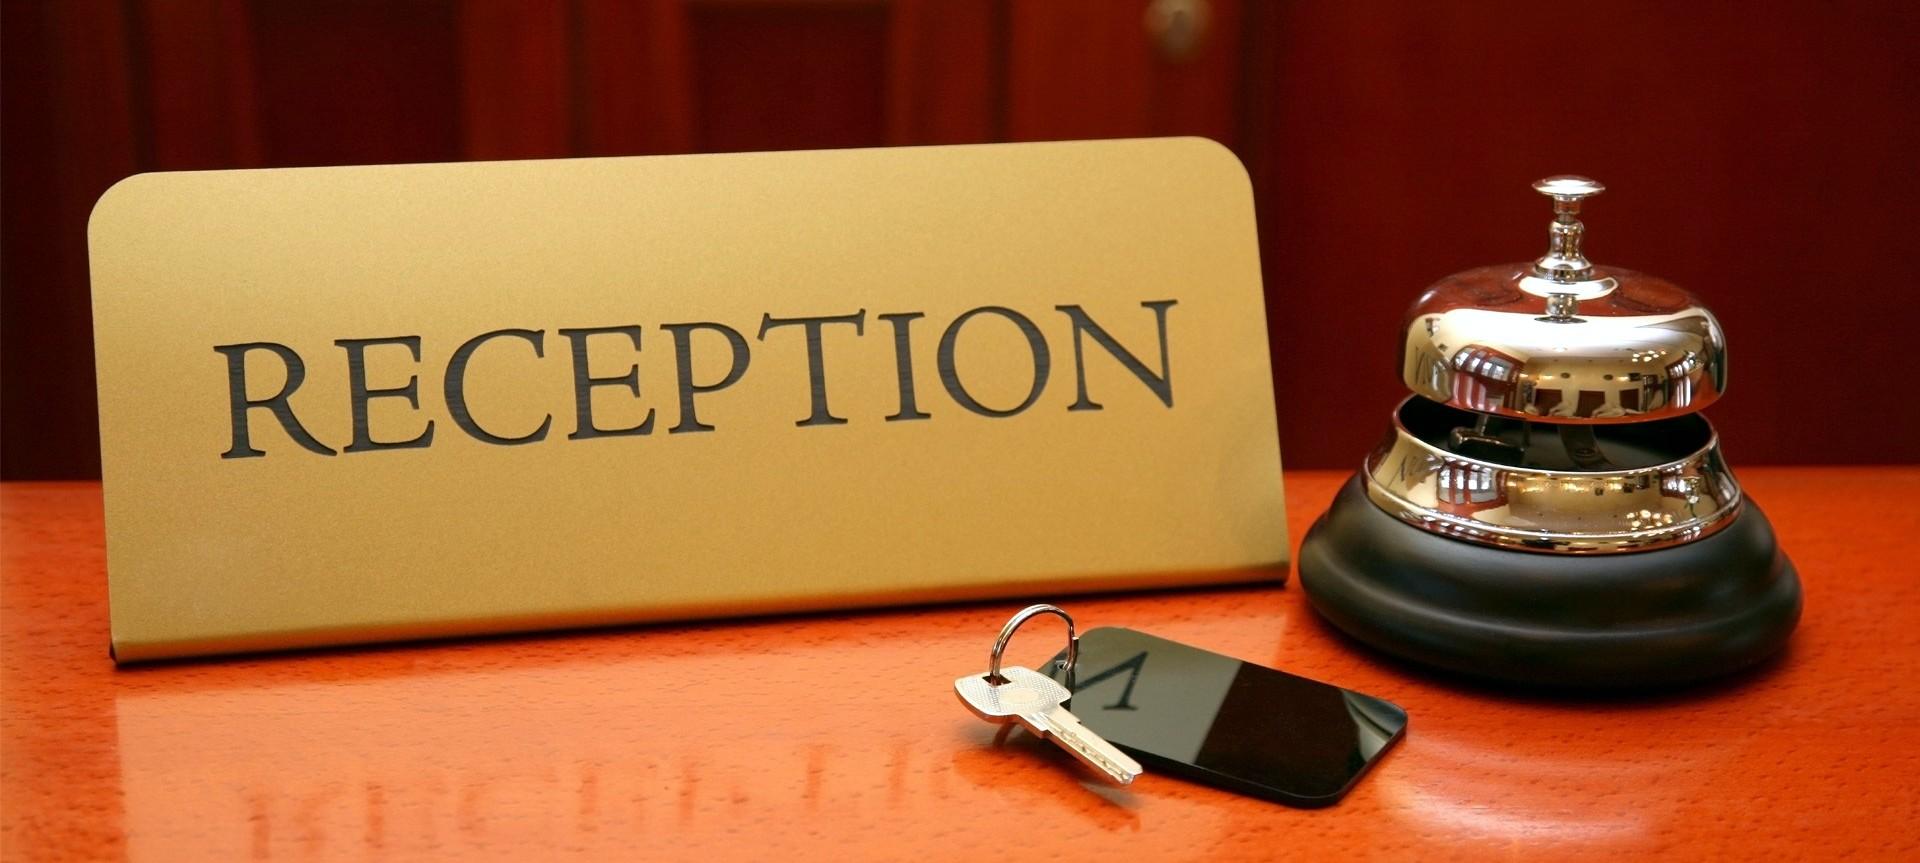 reception (1)